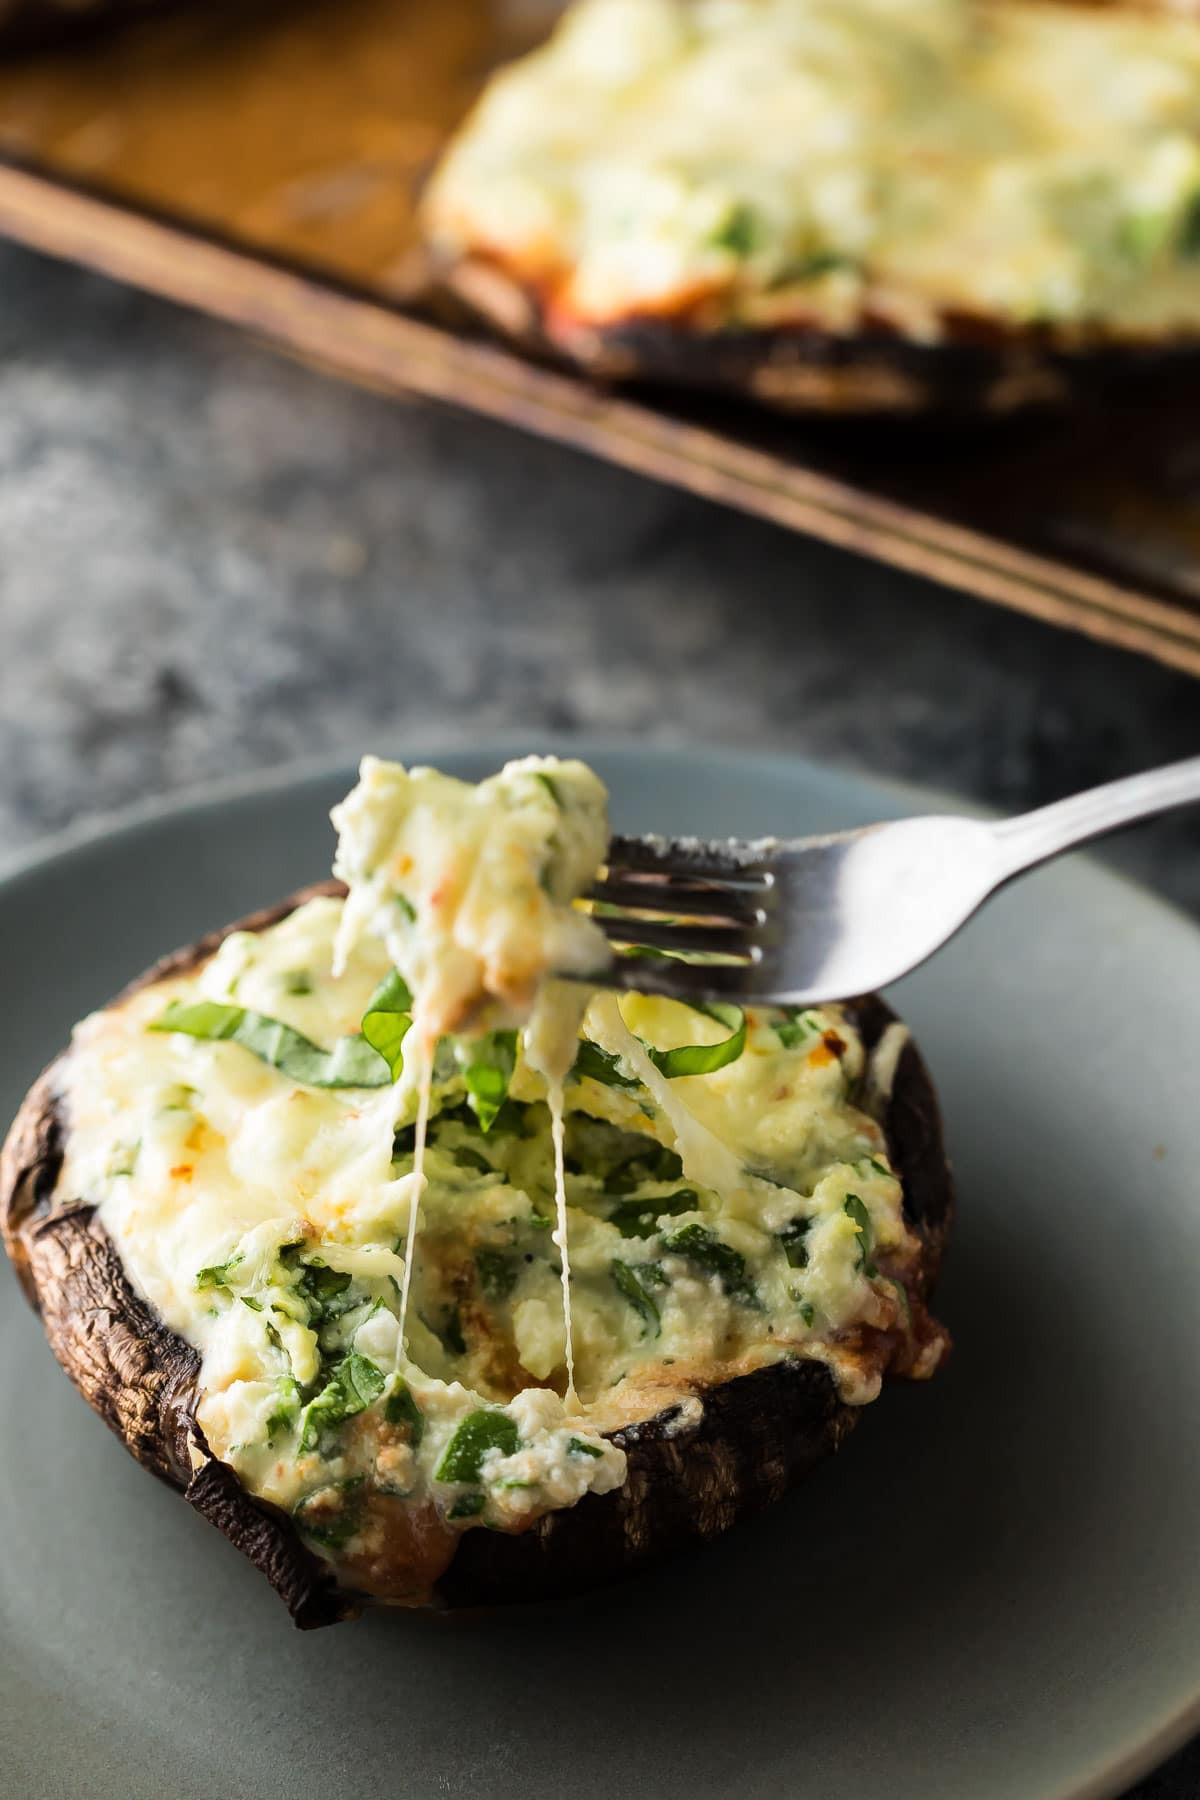 Stuffed Portabella Mushroom Recipe  Lasagna Stuffed Portobello Mushrooms Freezer to Oven